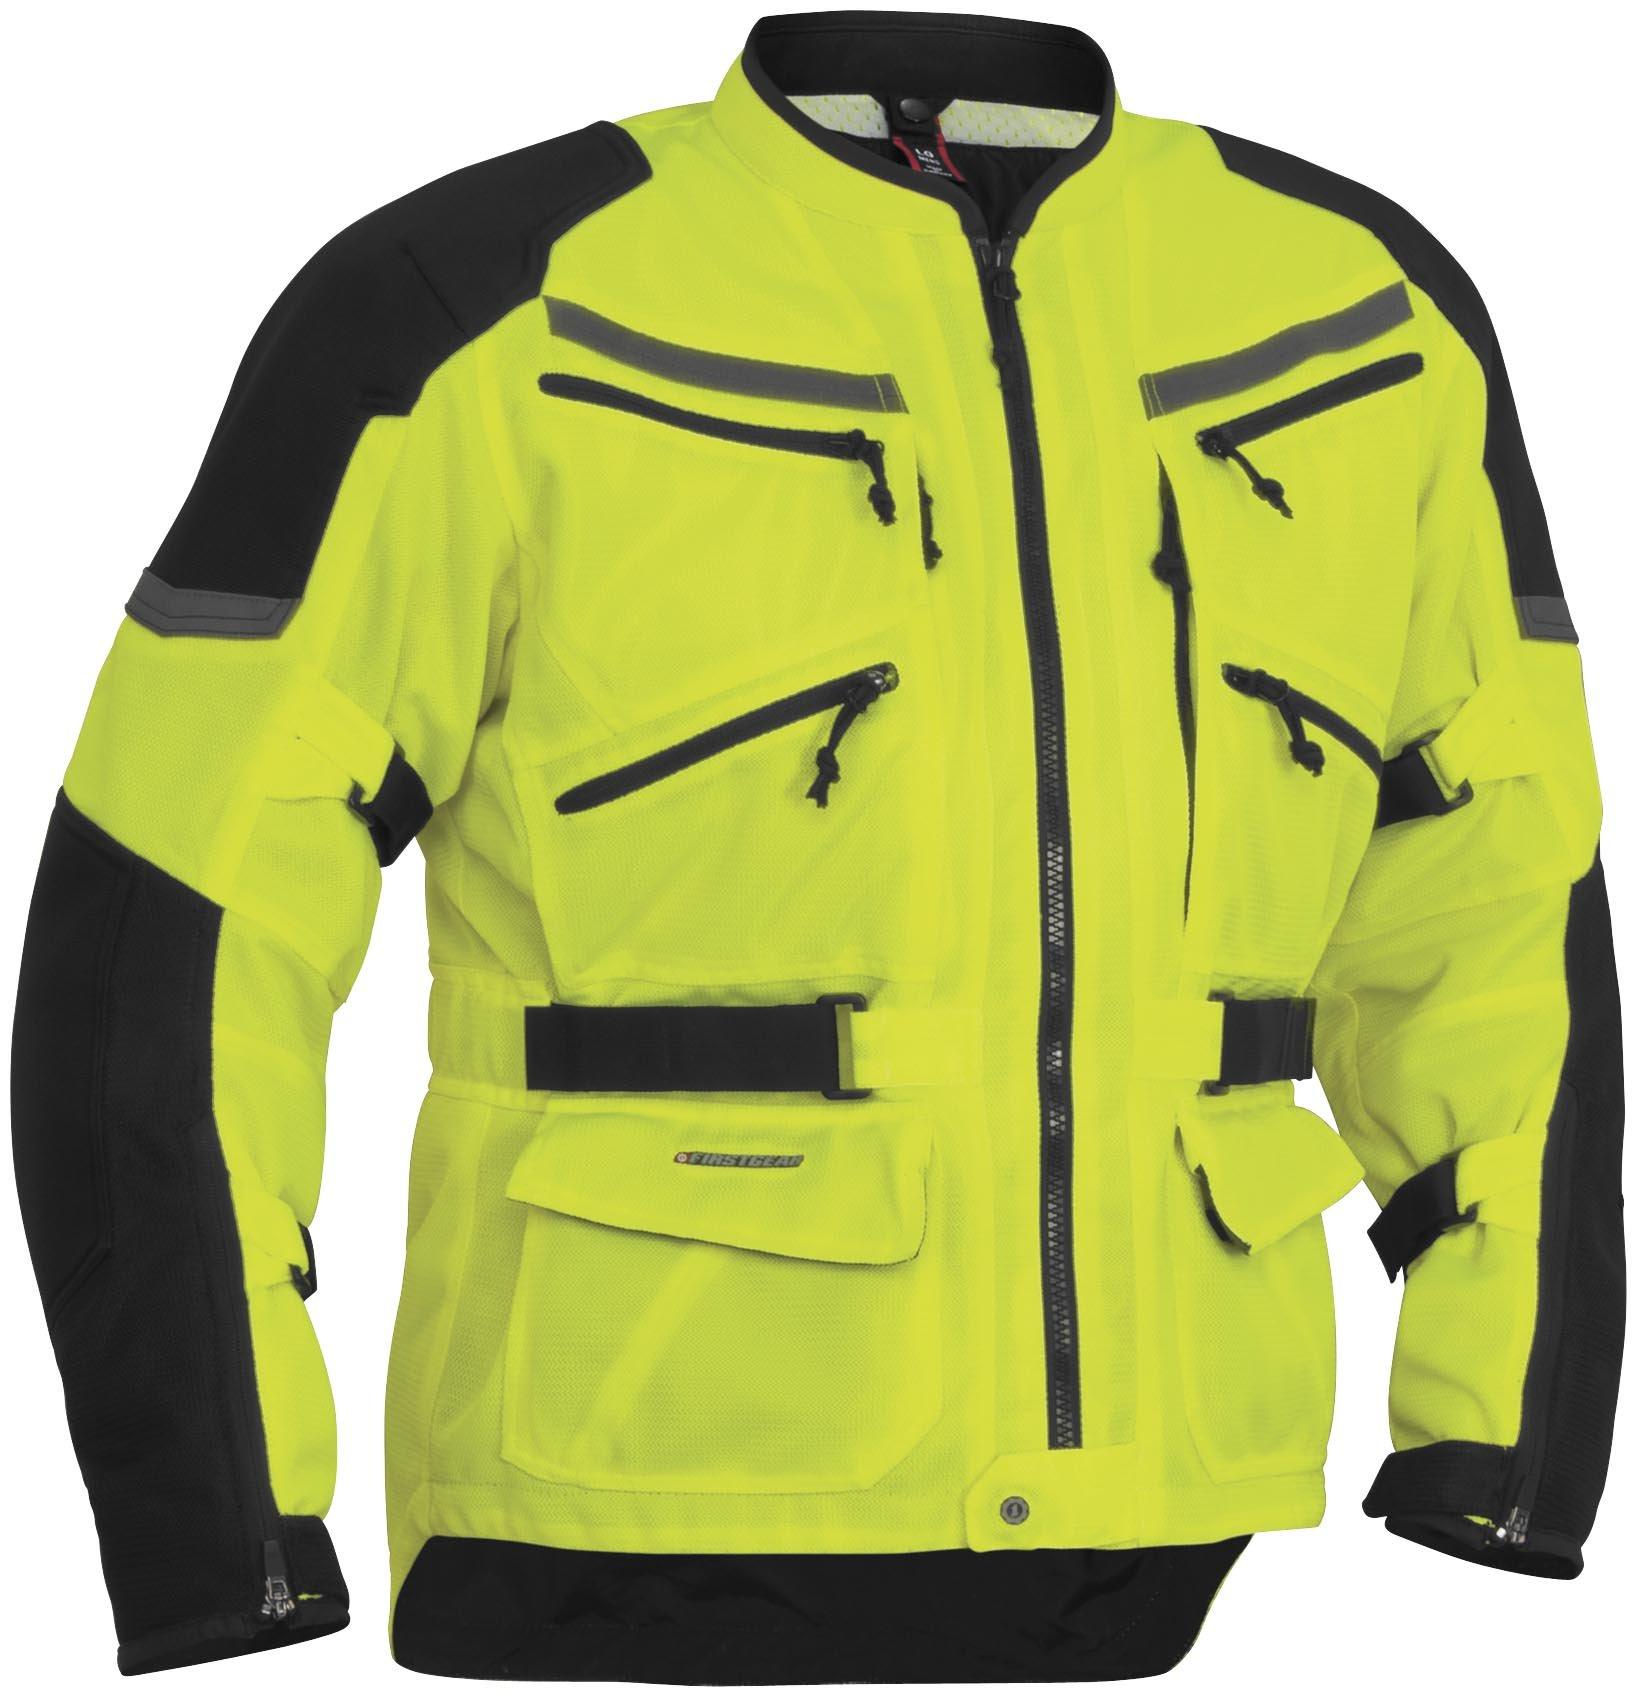 Firstgear Adventure Mesh DayGlo Yellow/Black Jacket, 2XL